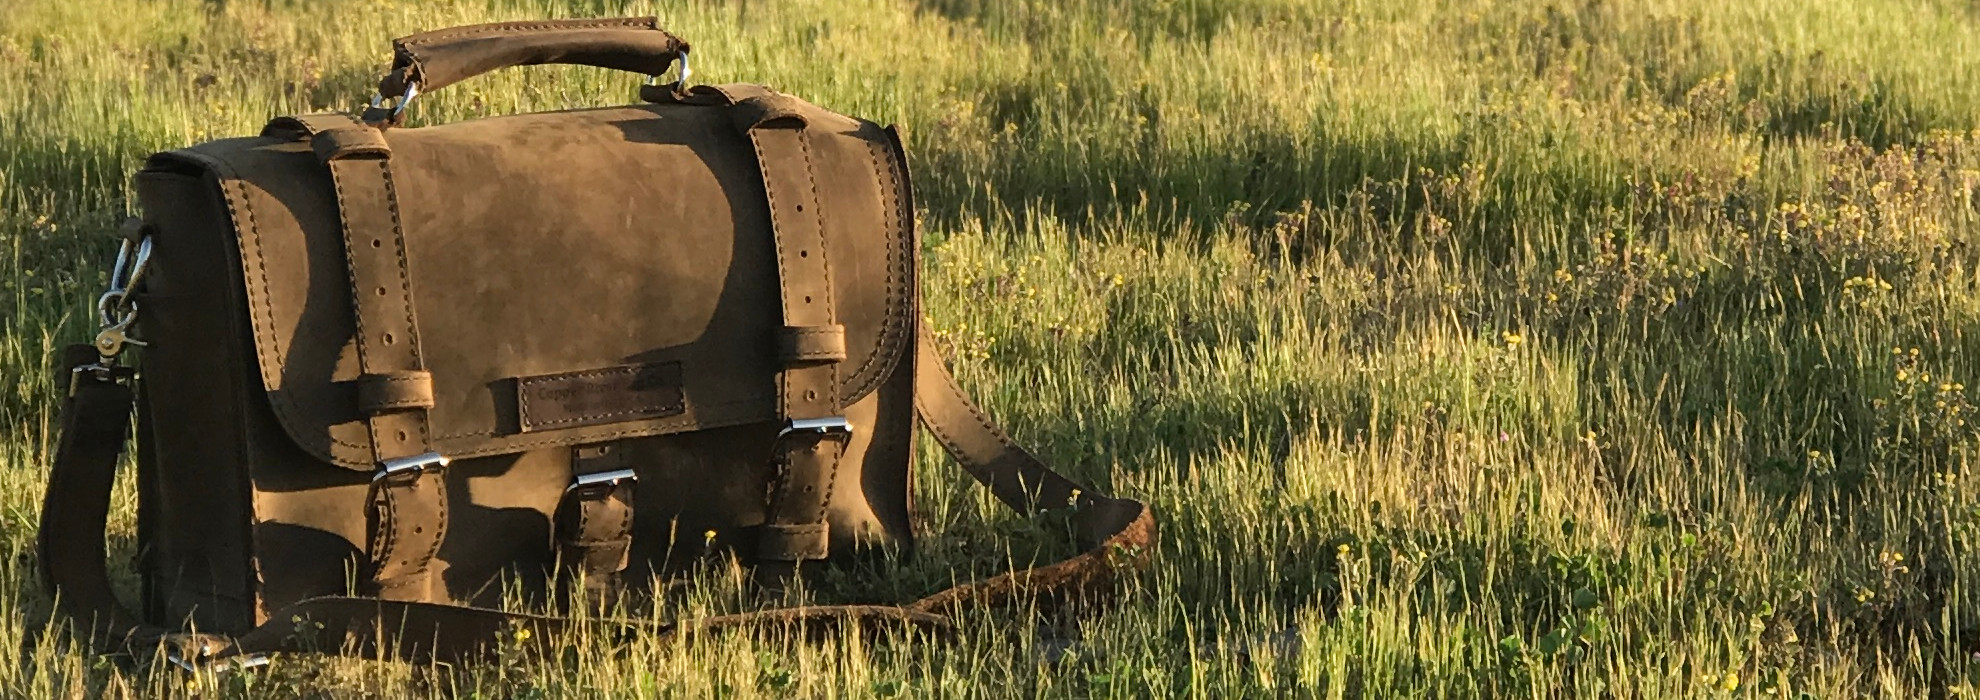 copper-river-bag-co-banner-made-in-america-9087654r.jpg